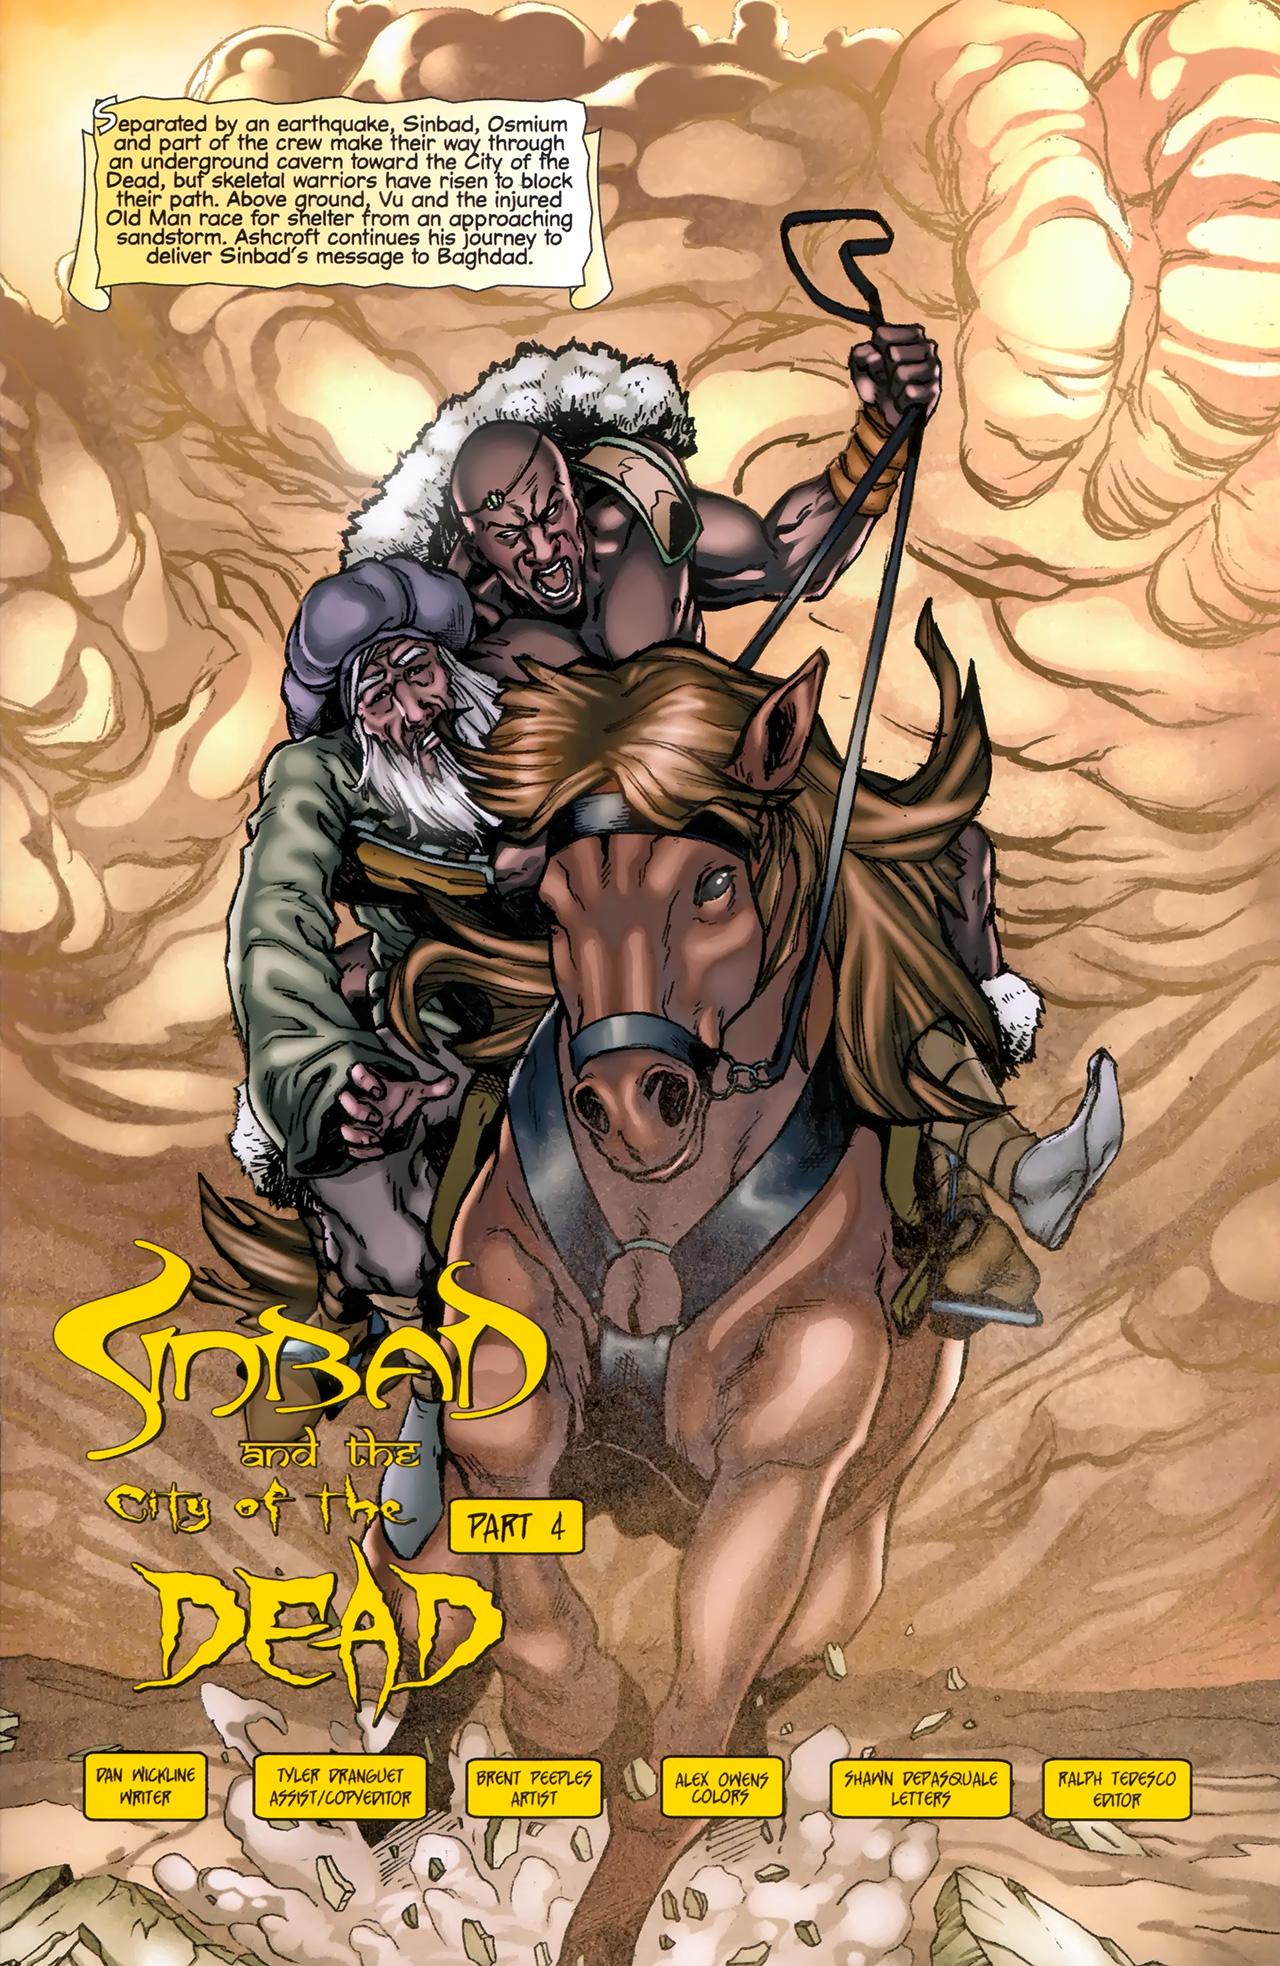 Read online 1001 Arabian Nights: The Adventures of Sinbad comic -  Issue #11 - 3